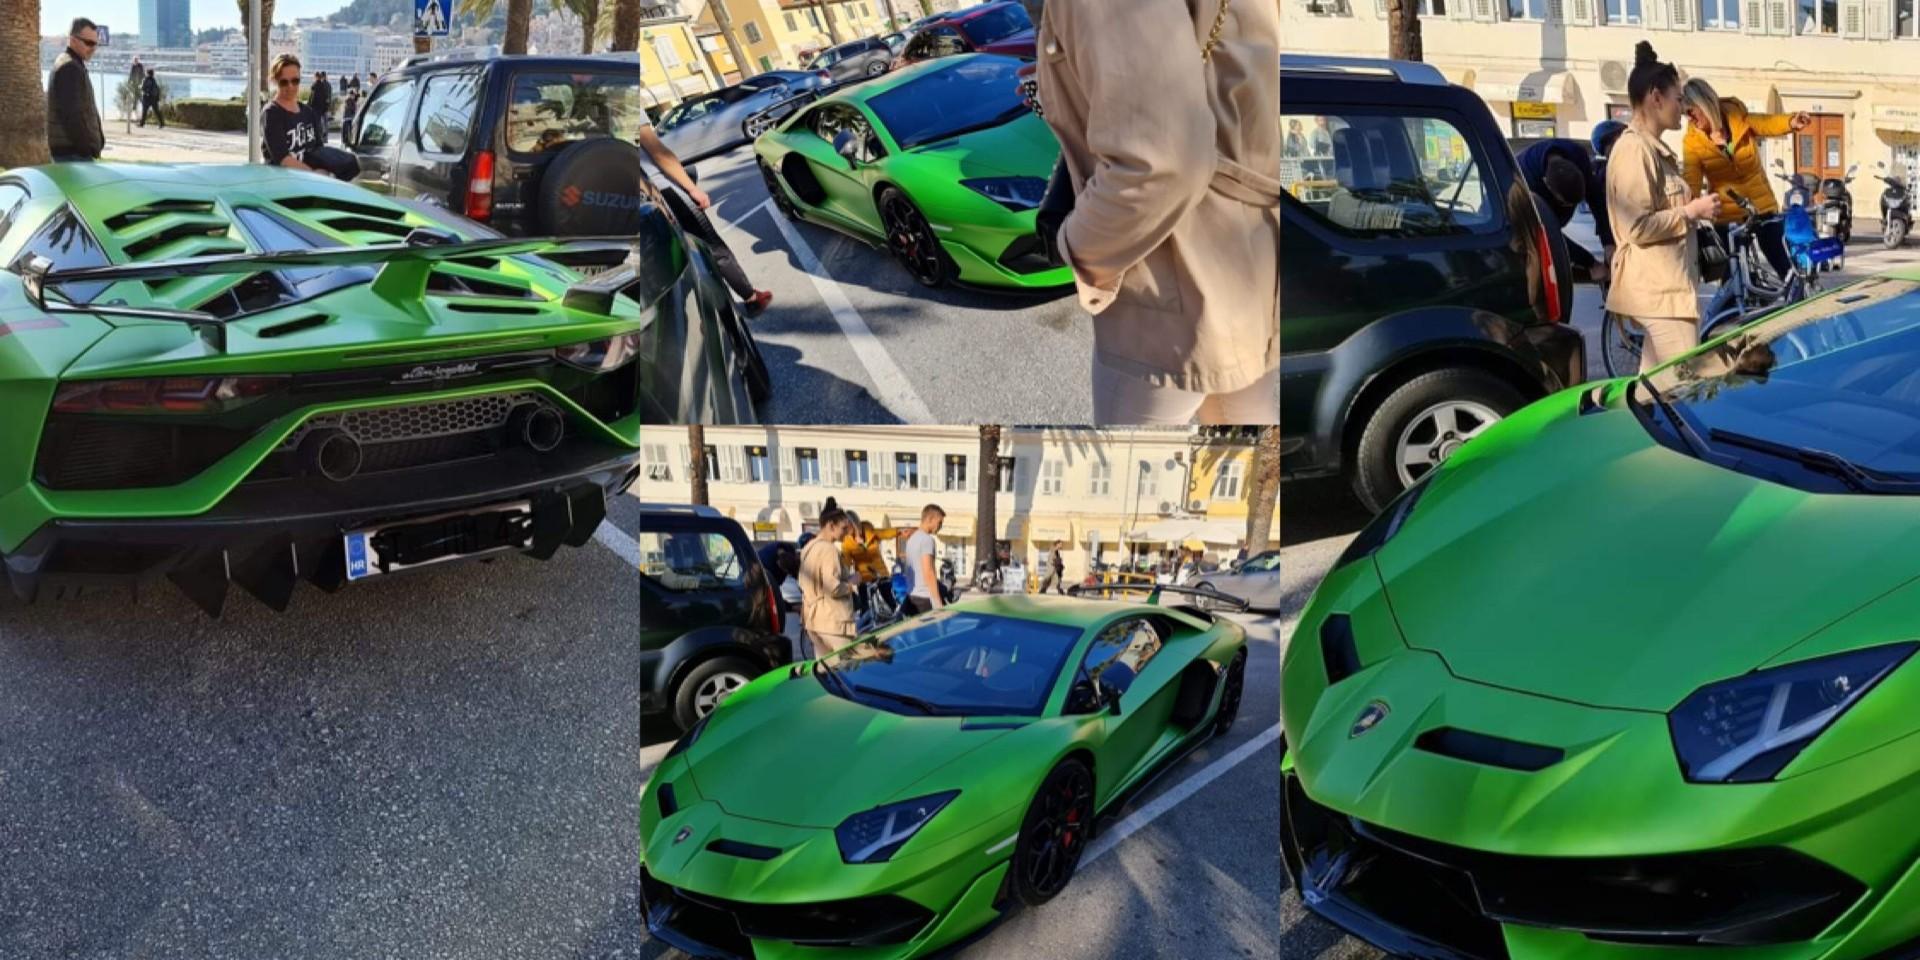 SPLIĆANI 'PARILI' OČI Kraj Turističke palače parkiran superluksuzni Lamborghini